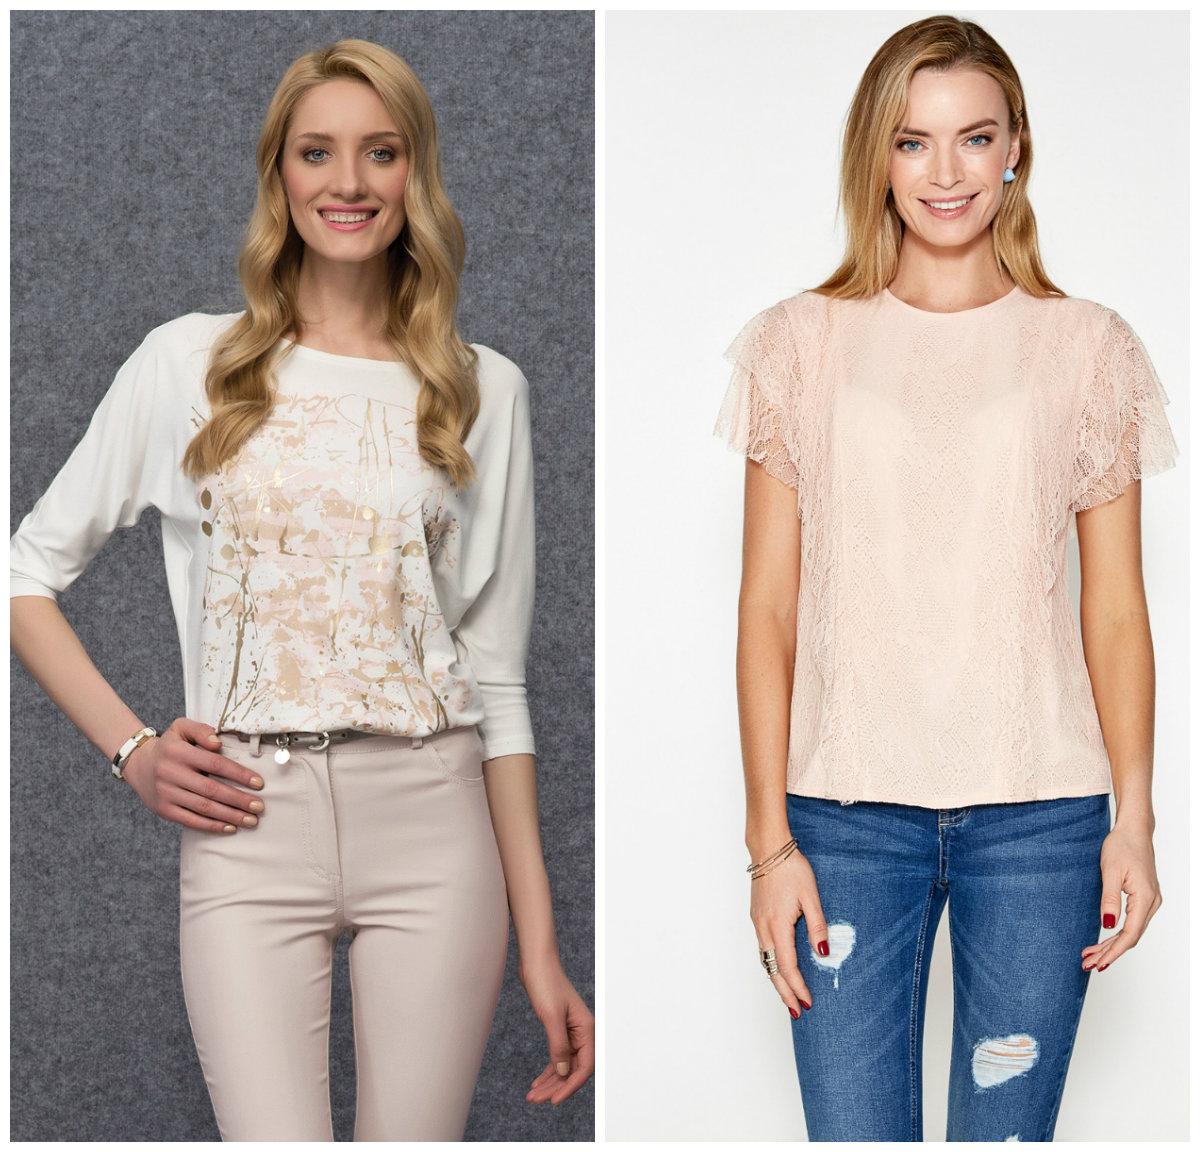 женские блузки 2019, фото-модные-блузки-2019-модели-и-тенденции